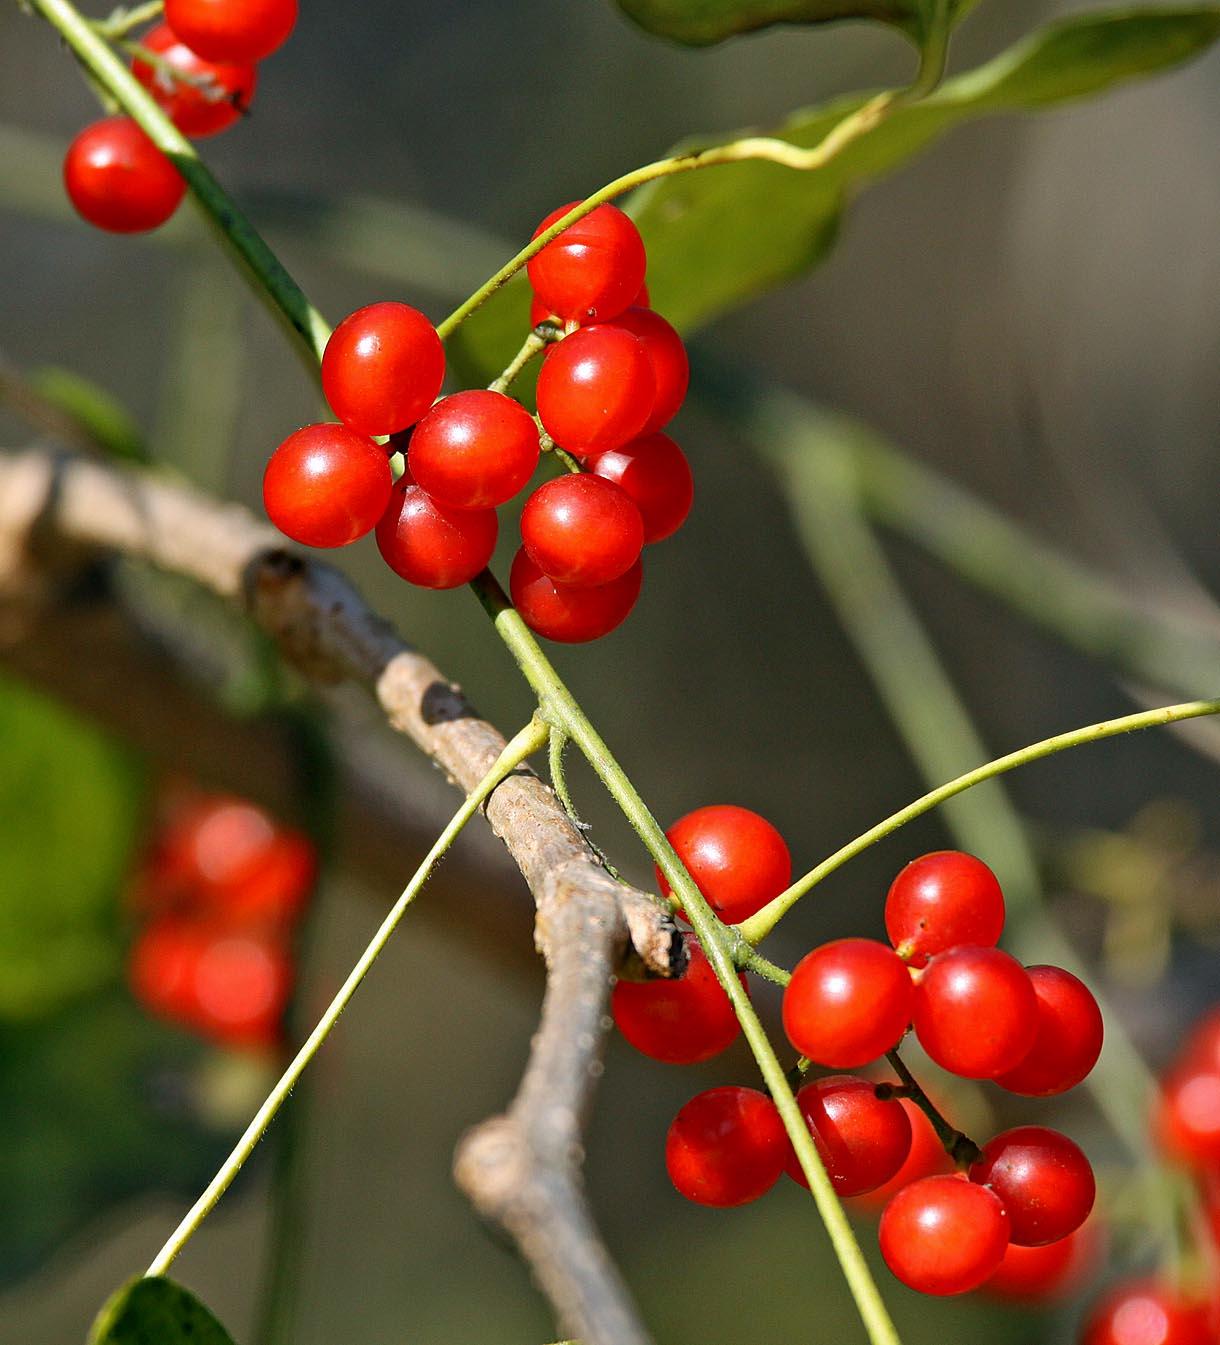 Southern Lagniappe: December Lagniappe: Vines And Berries